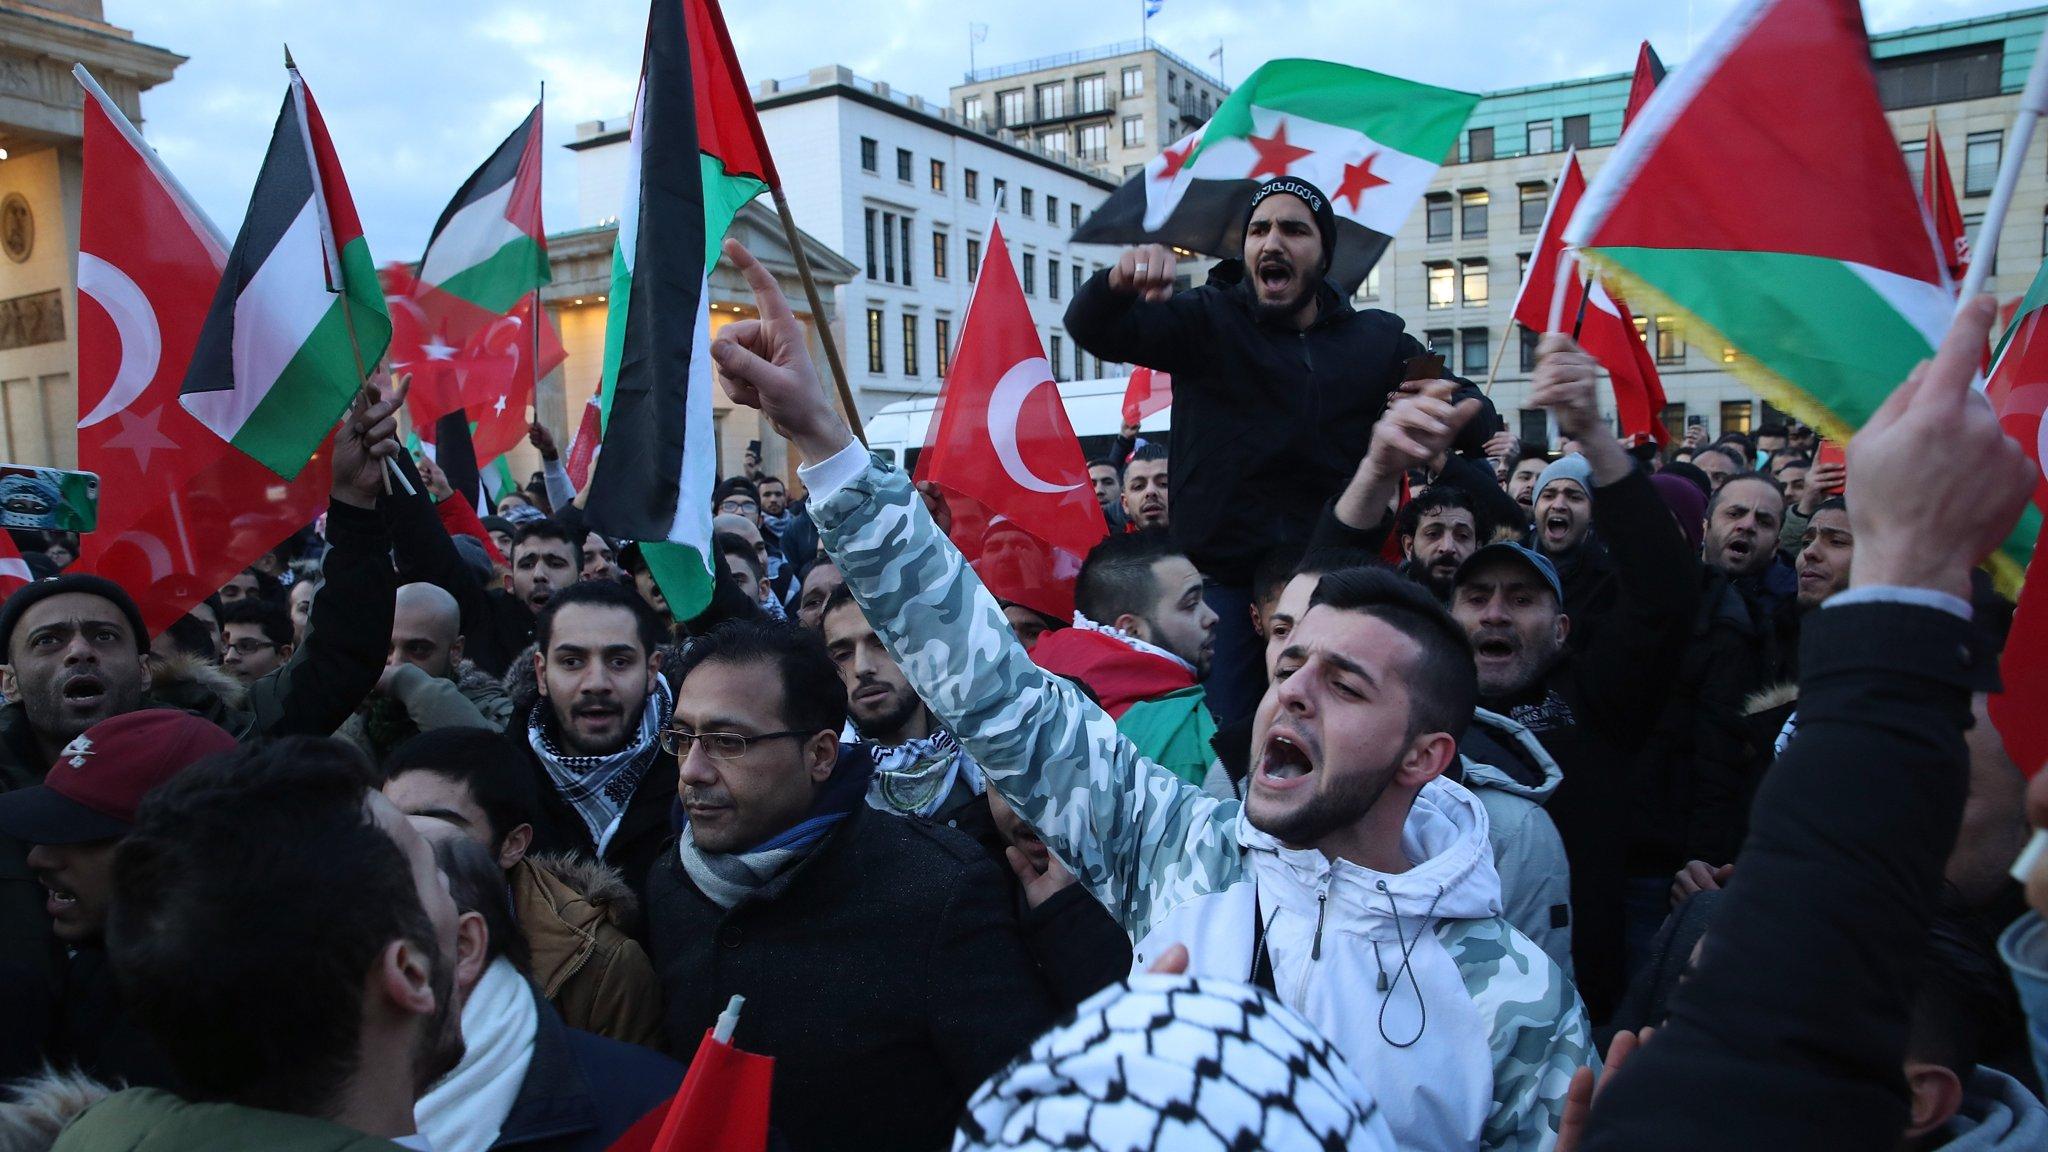 German protests prompt fears of rising anti-Semitism